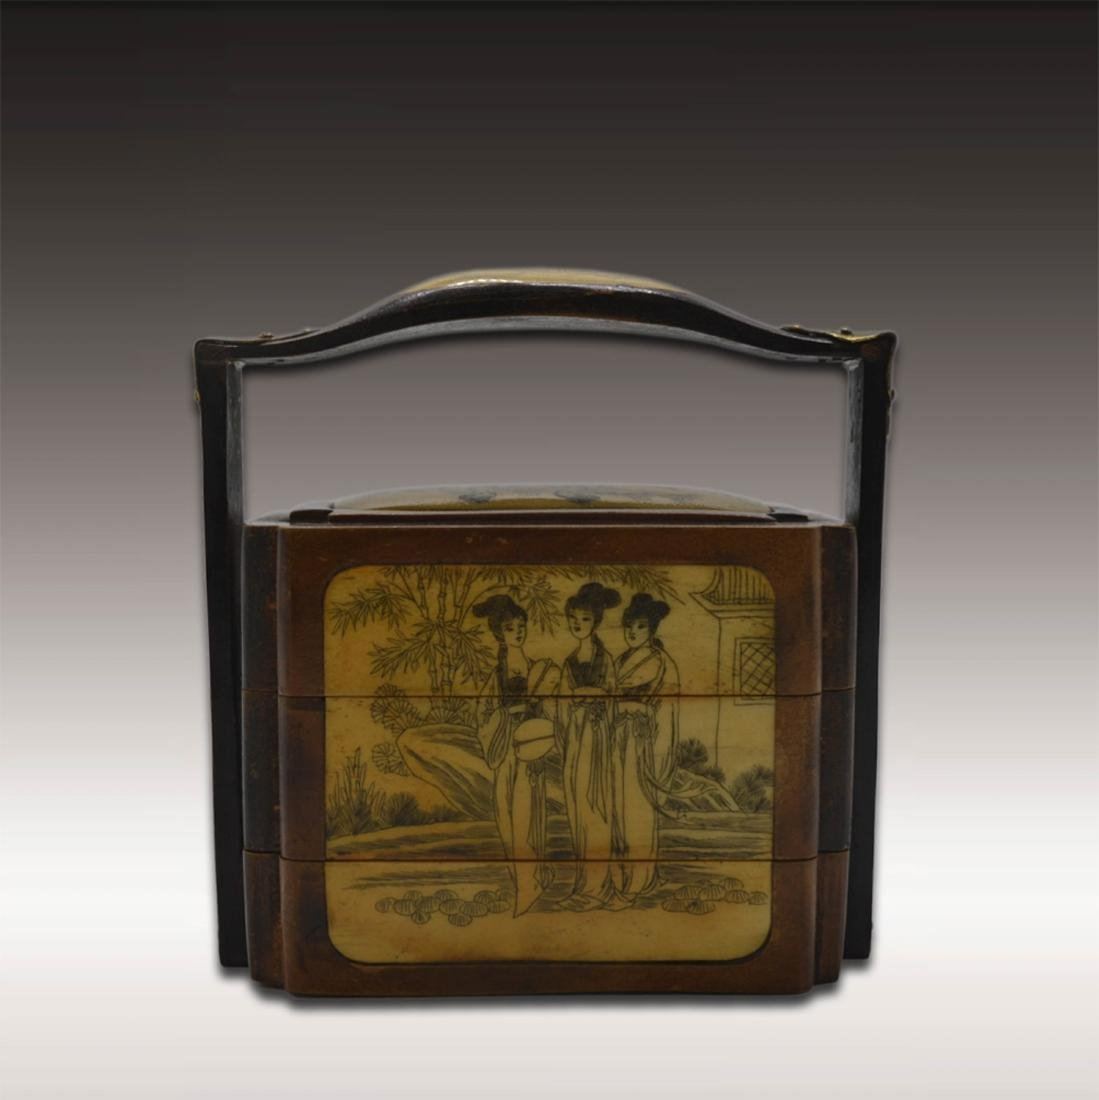 Chinese Huang Hua Li Lunch Box